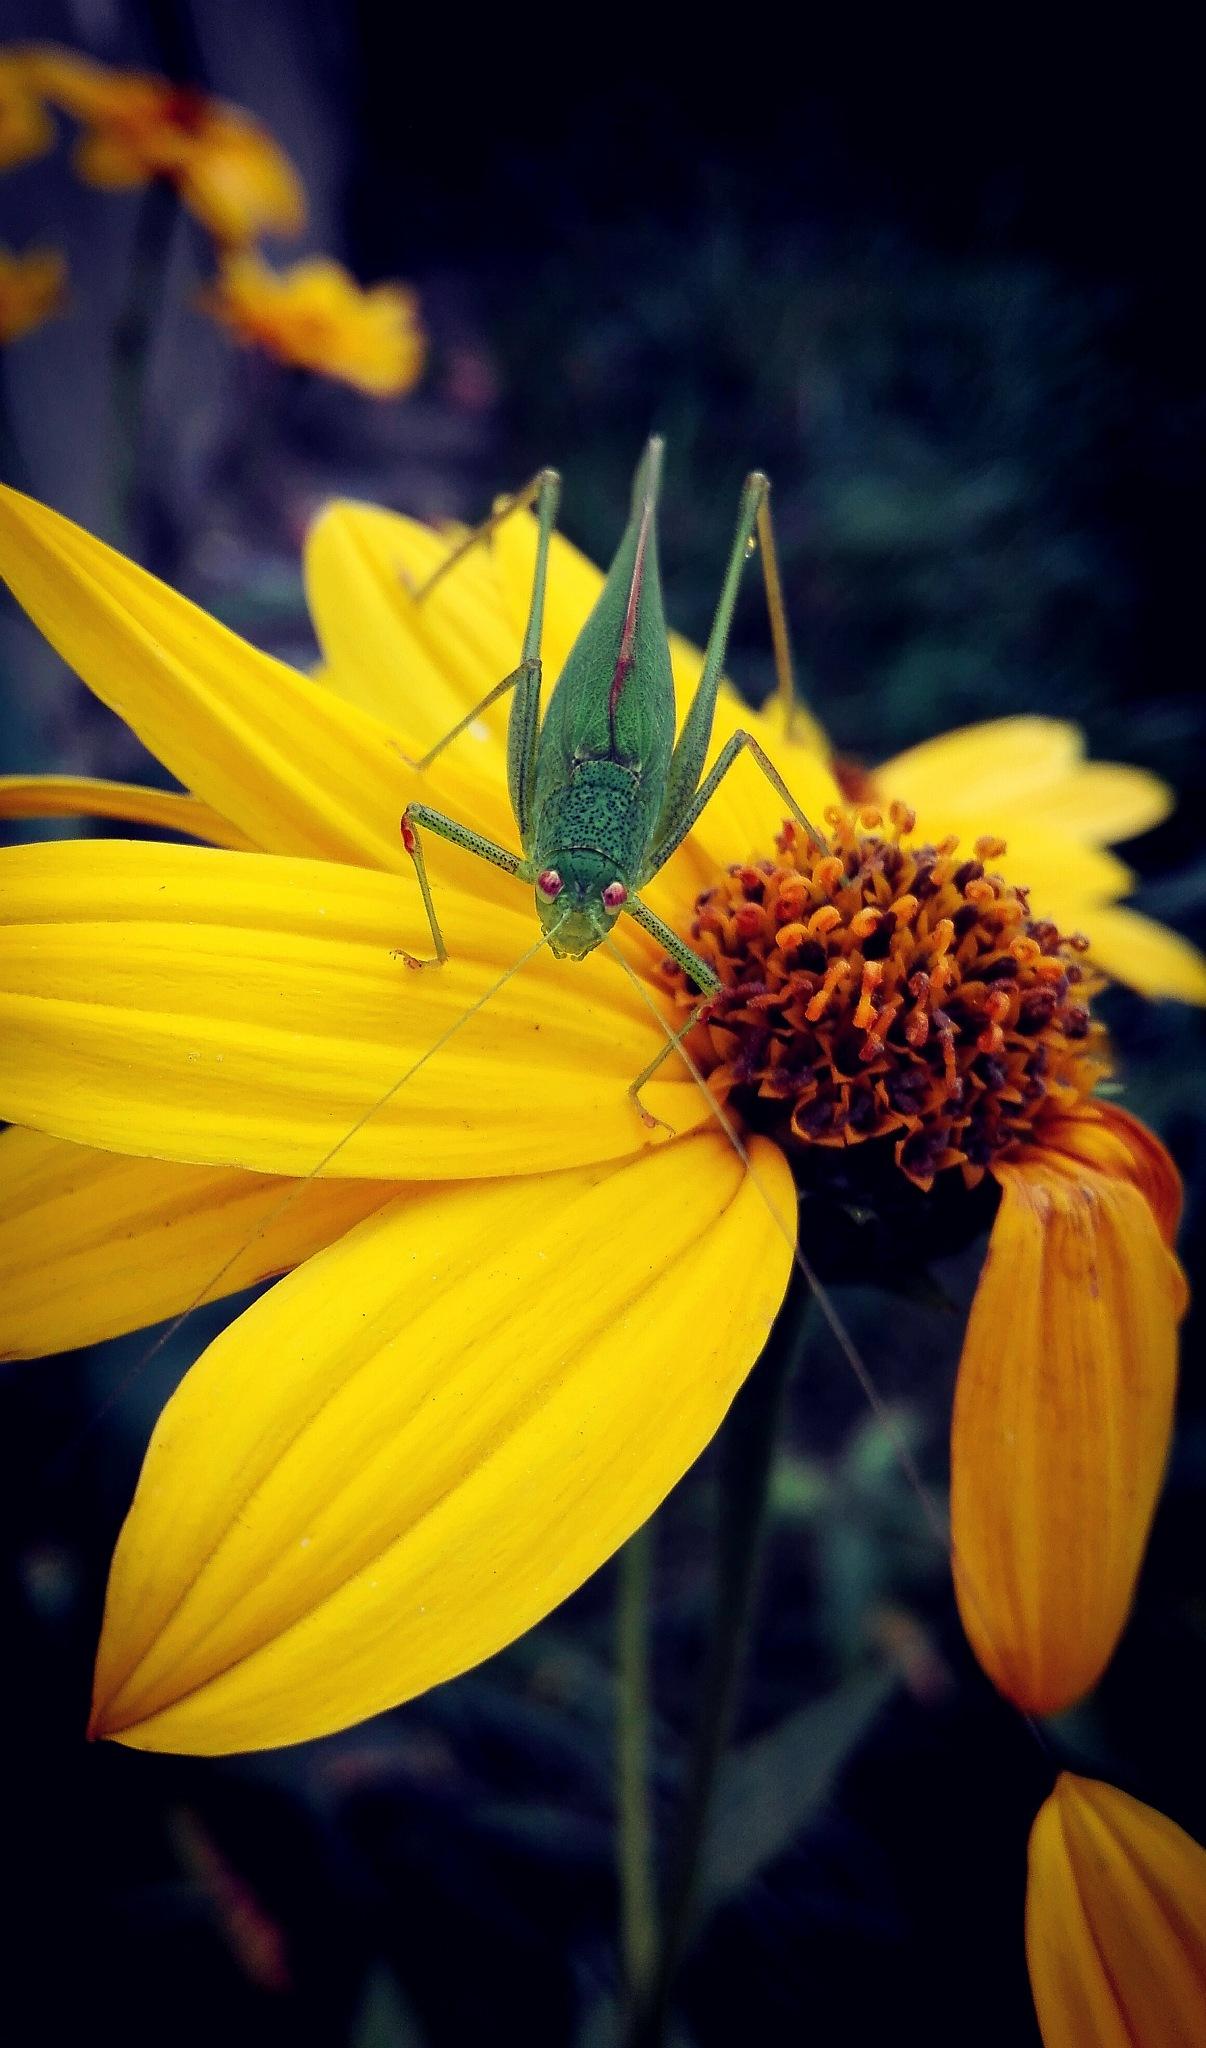 green grasshopper on helianthus tuberosus by  Gaelle Le Meur